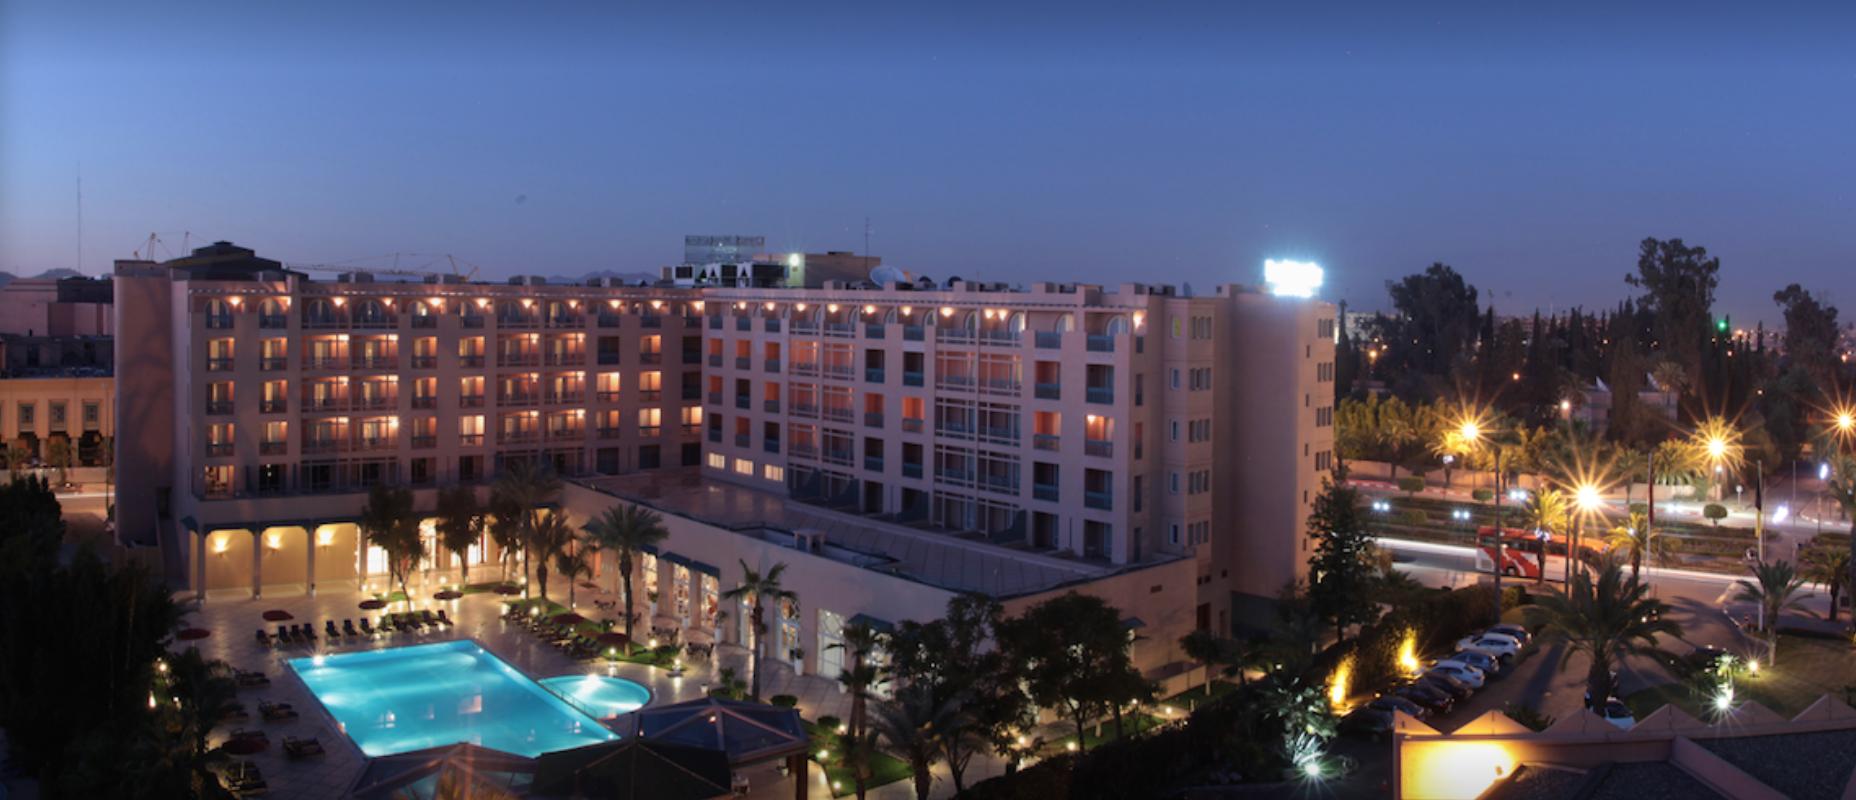 movenpick hotel id4africa